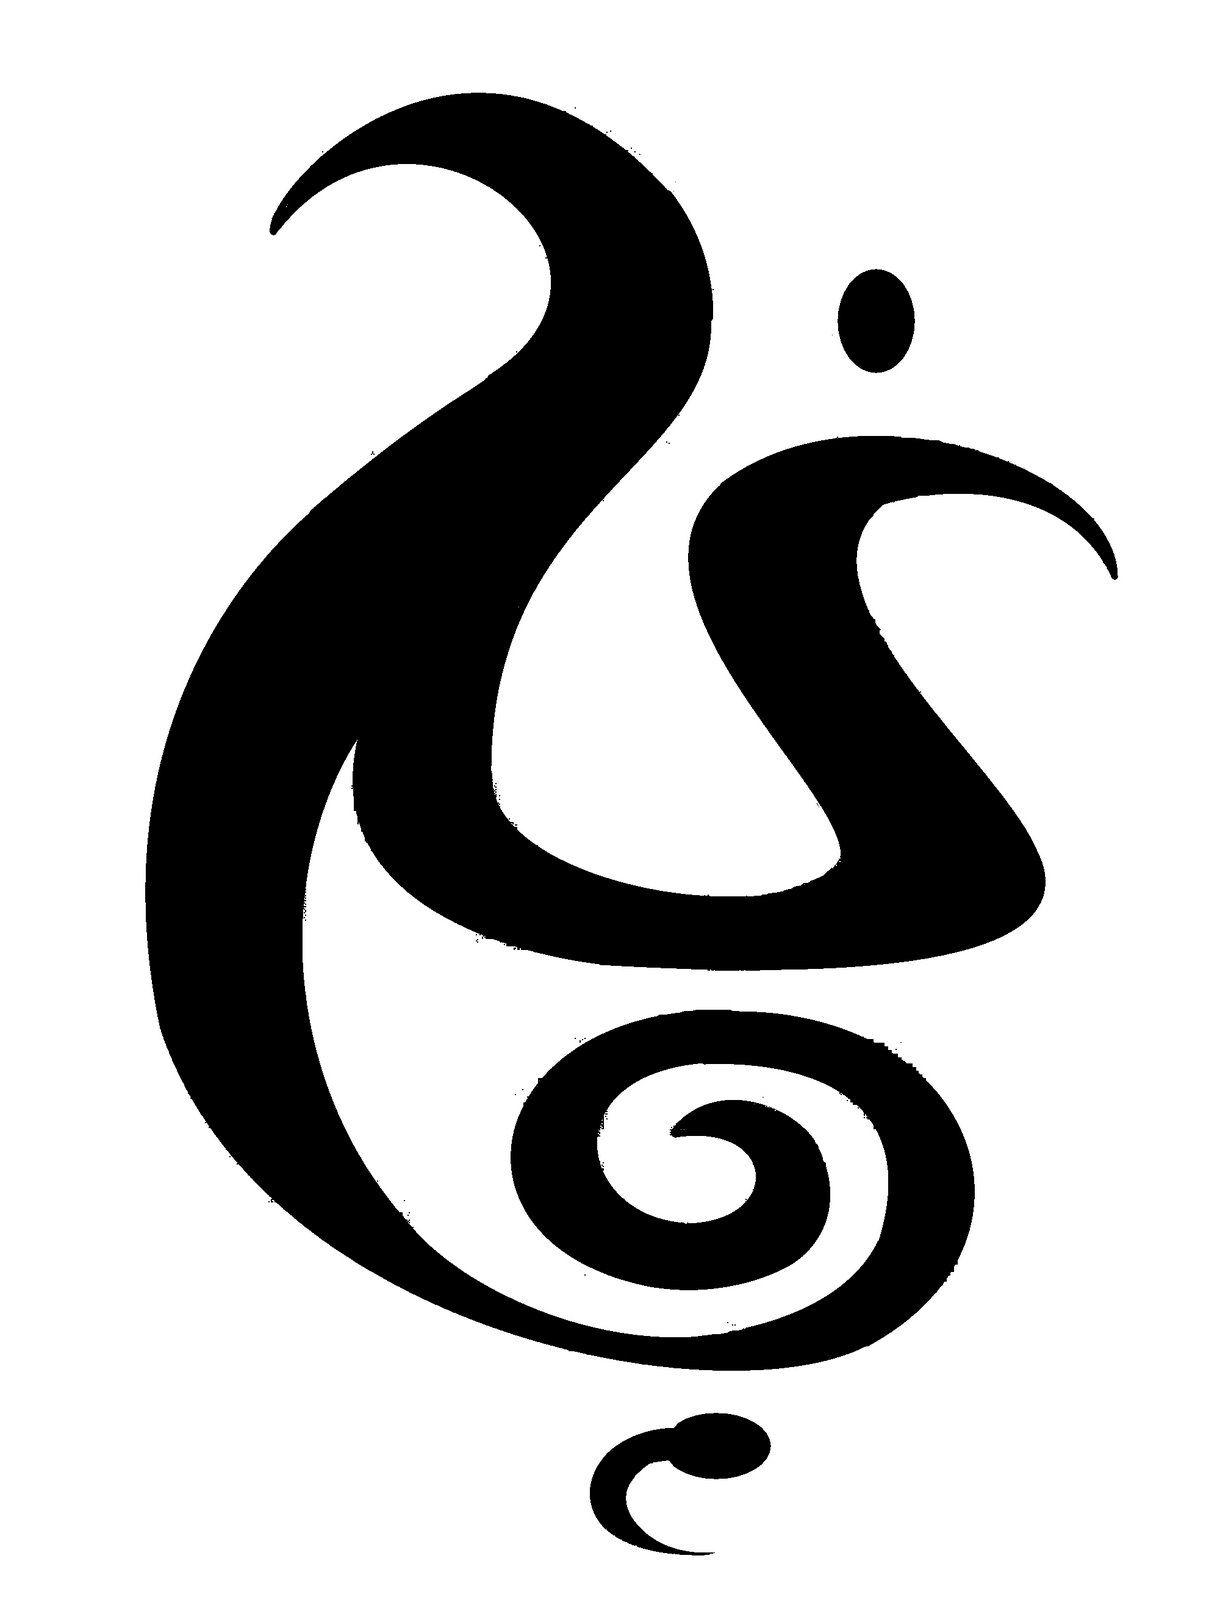 Pin by olivia murray on beautiful loving tattoos pinterest tattoo soul mate symbol maori culture maori story of creation pinned by the mystics emporium on etsy mother son tattoos biocorpaavc